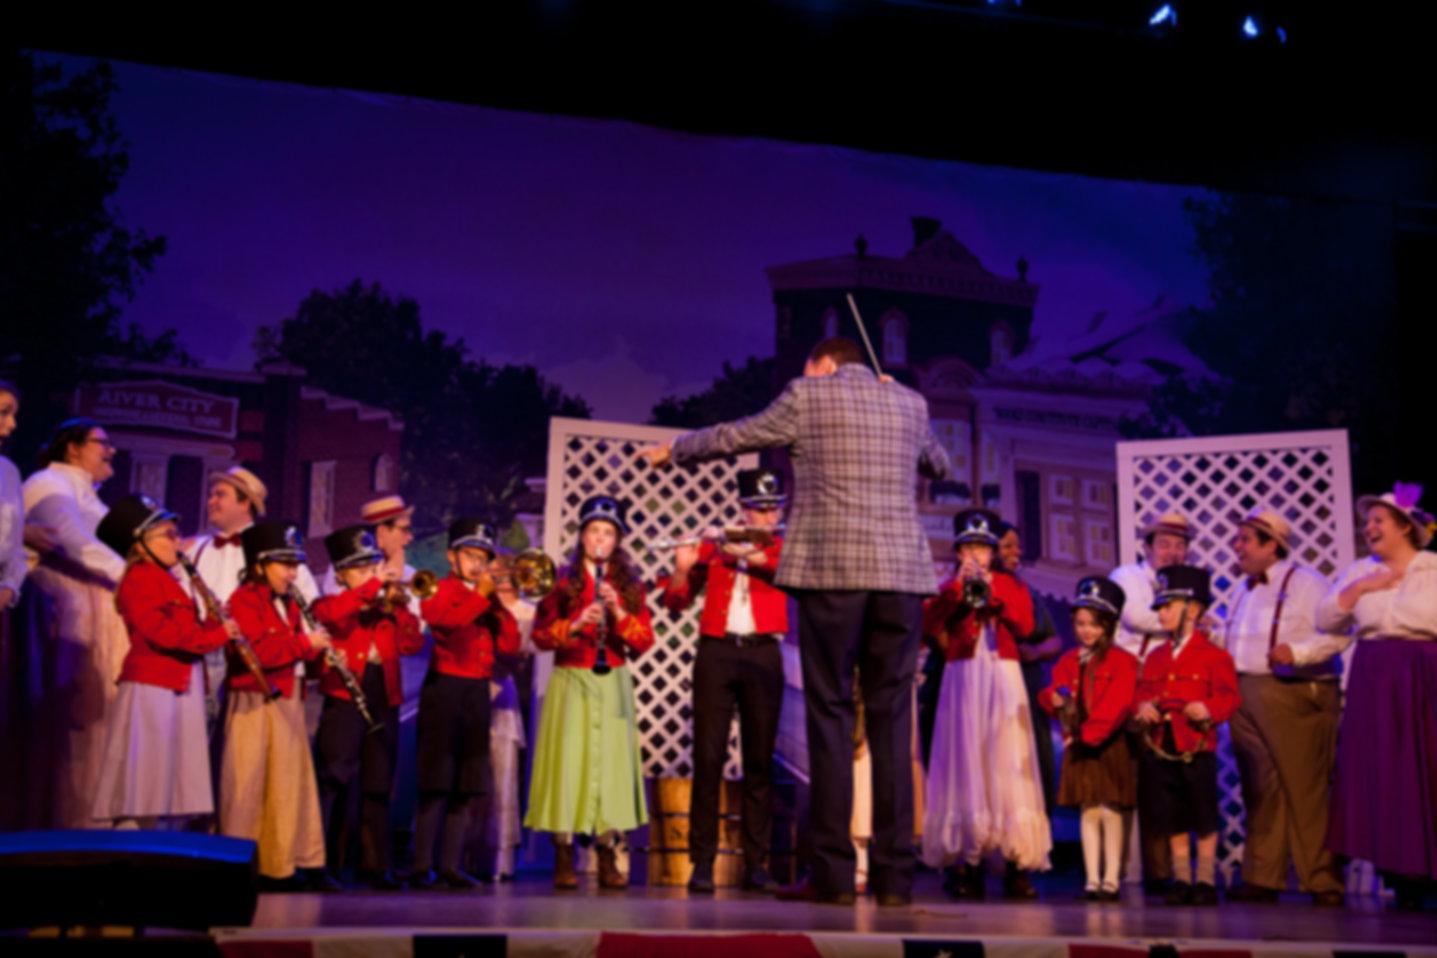 574 Theatre's The Music Man